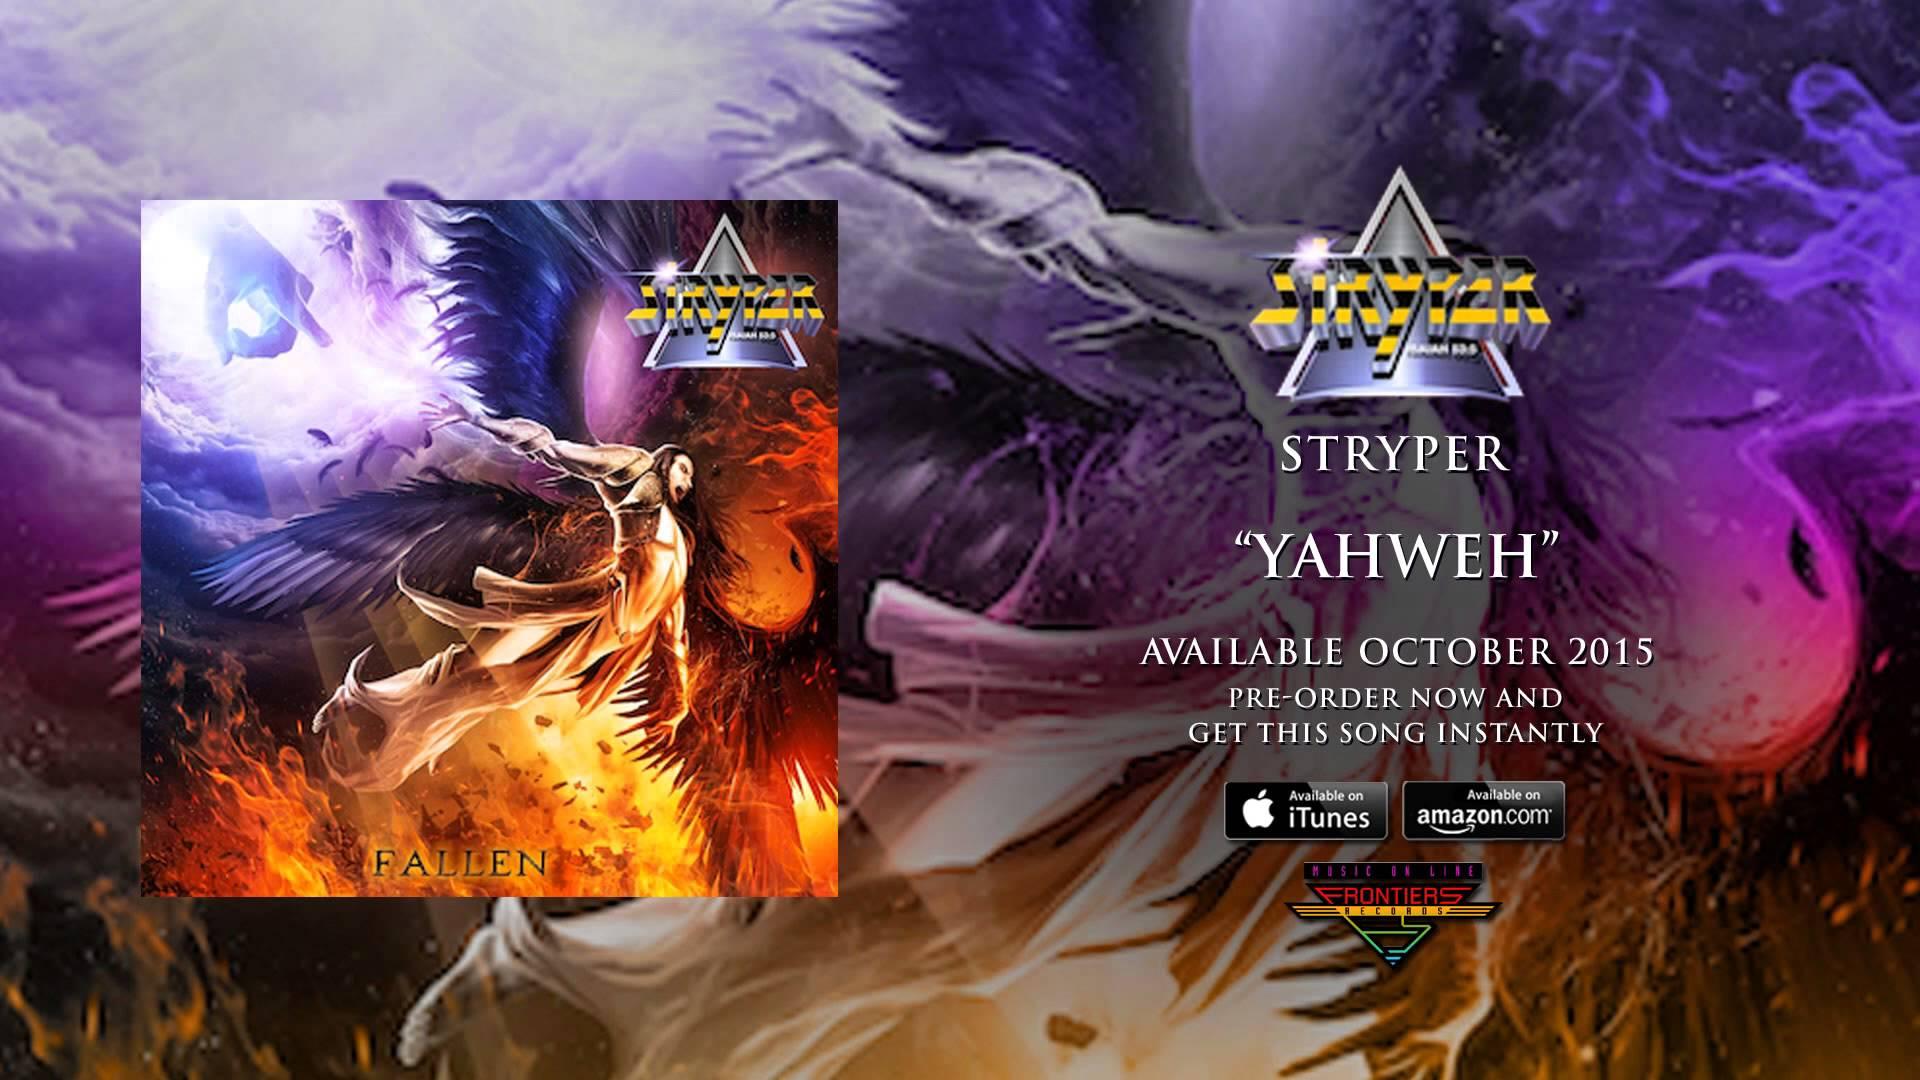 Michael Sweet talks about origins of brand new Stryper single 'Yahweh'